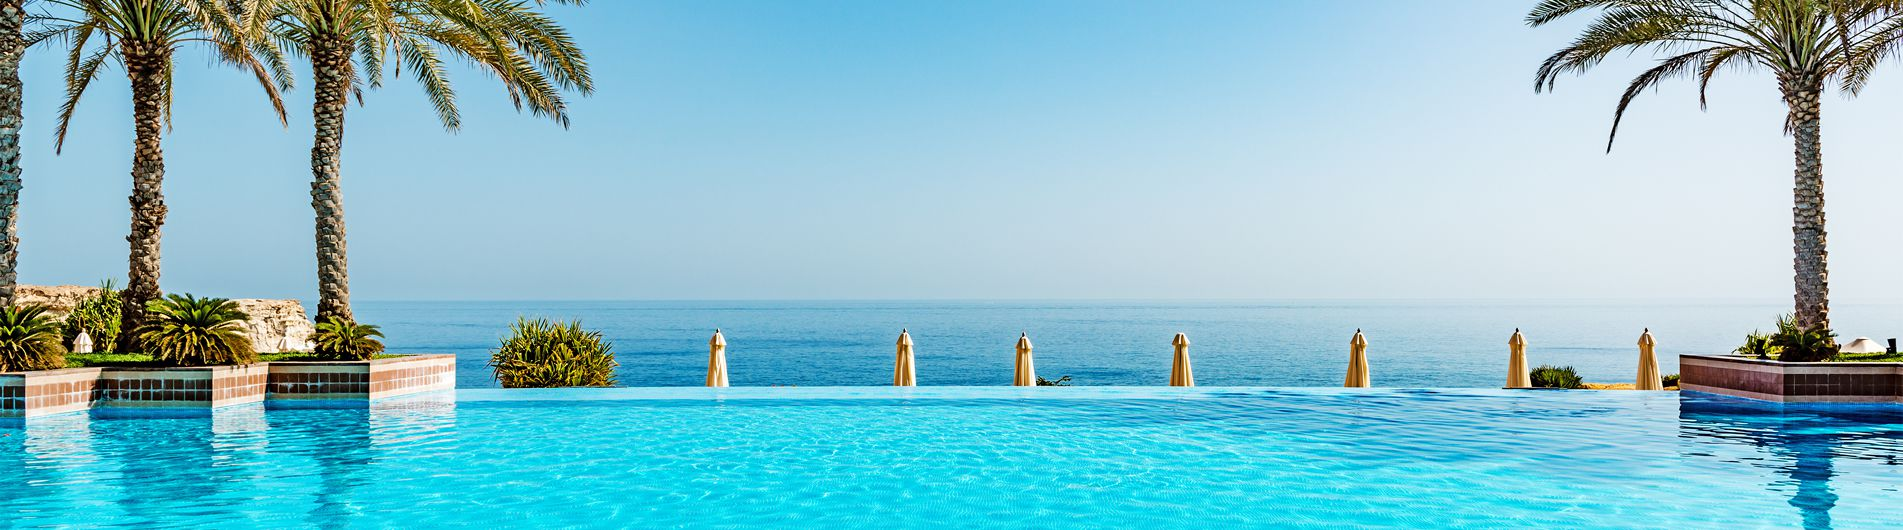 Oman Holidays 2019 / 2020 | Cyplon Holidays